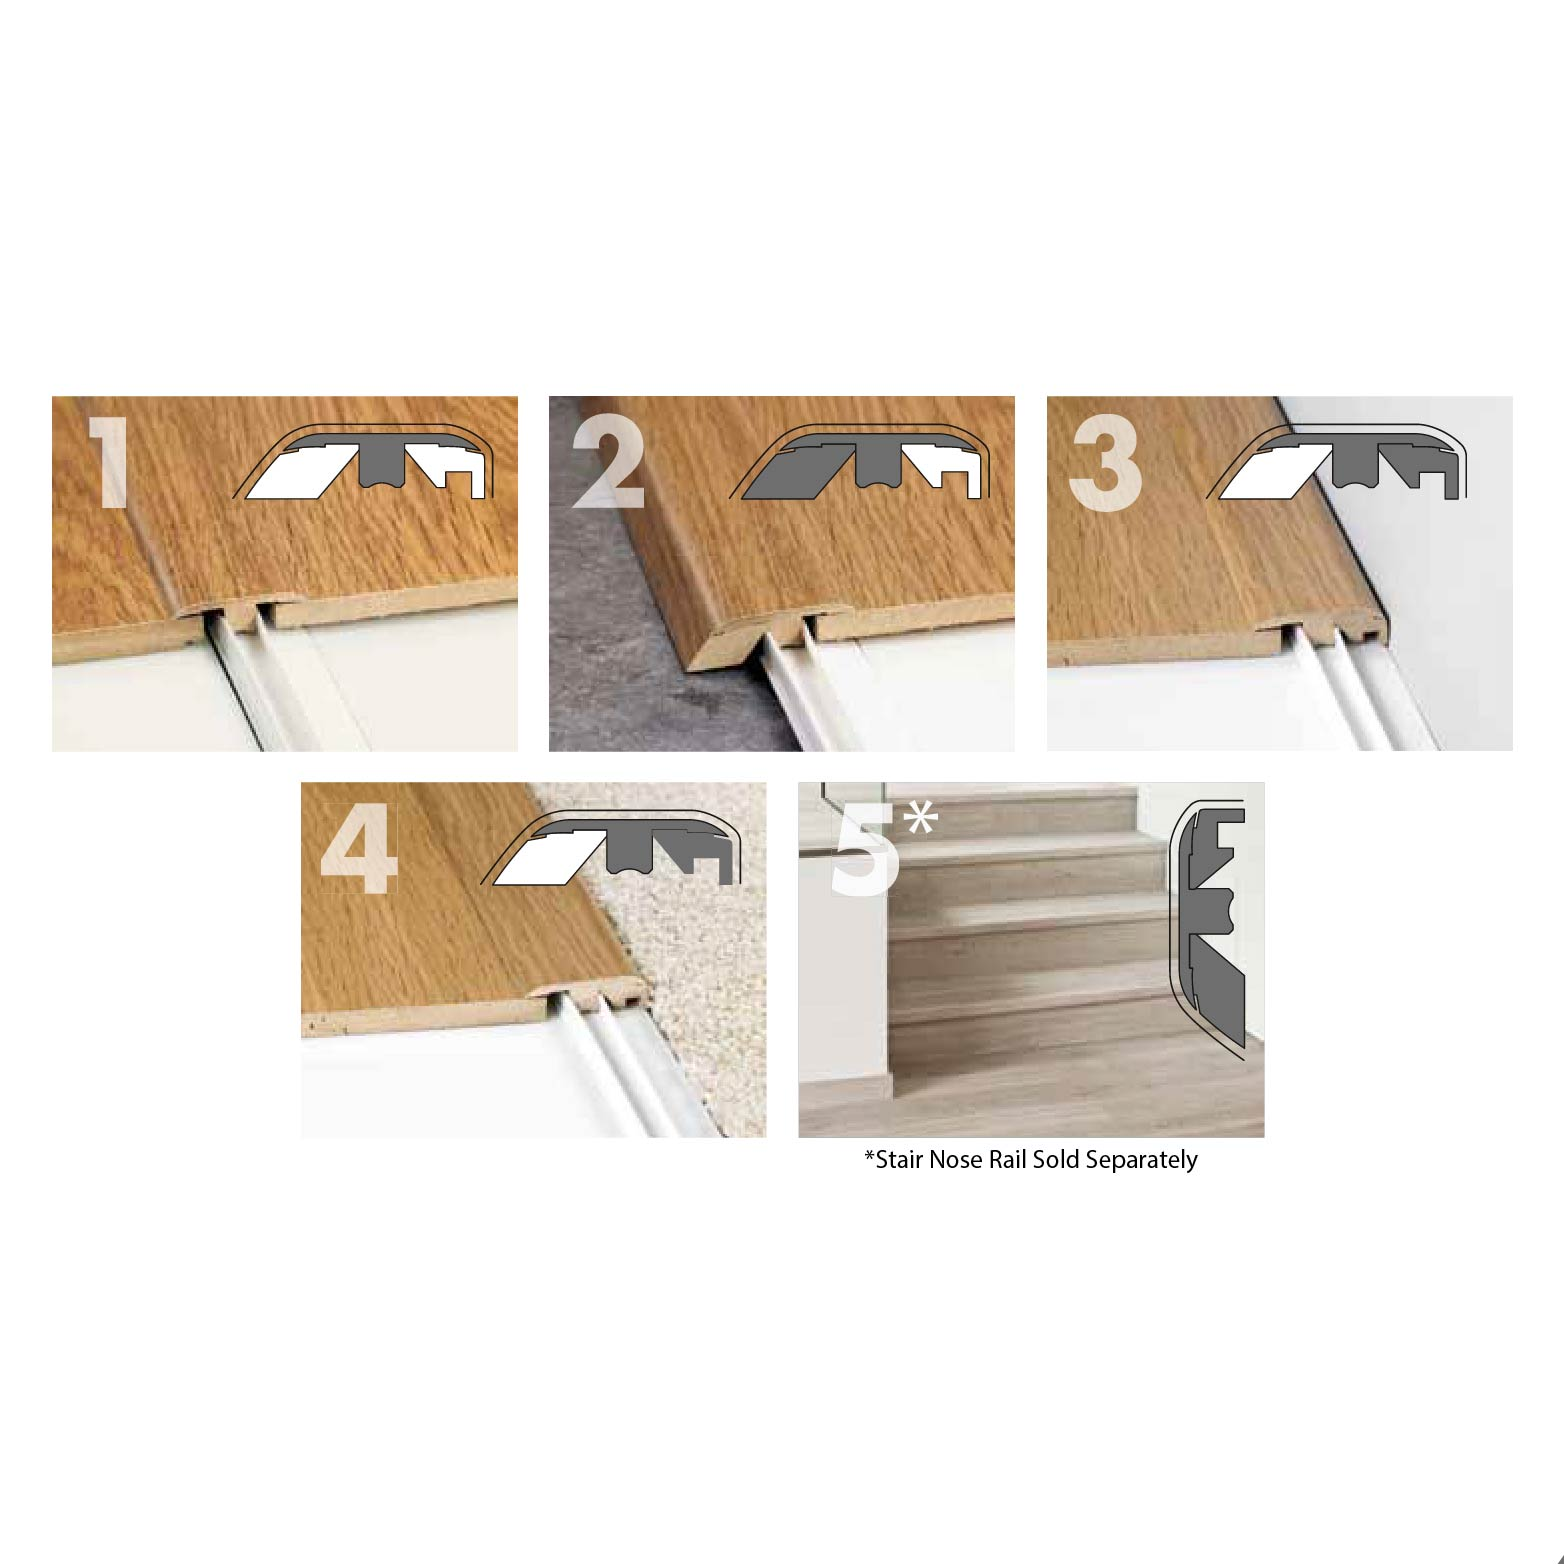 Mohawk Laminate 5 In 1 Molding Piece, Mohawk Laminate Flooring Transitions